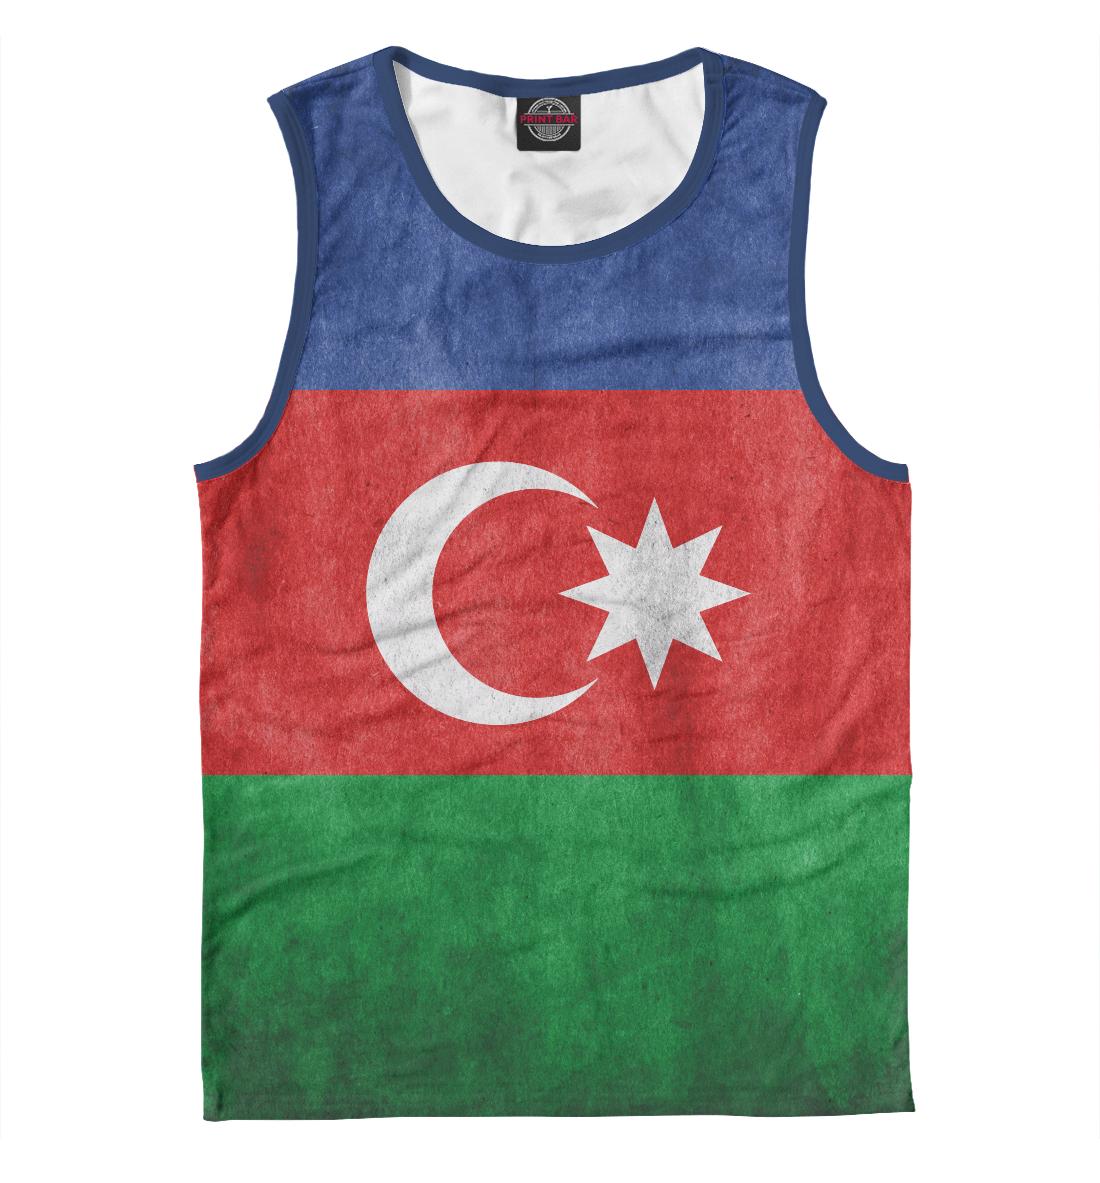 Купить Флаг Азербайджана, Printbar, Майки, CTS-188115-may-2